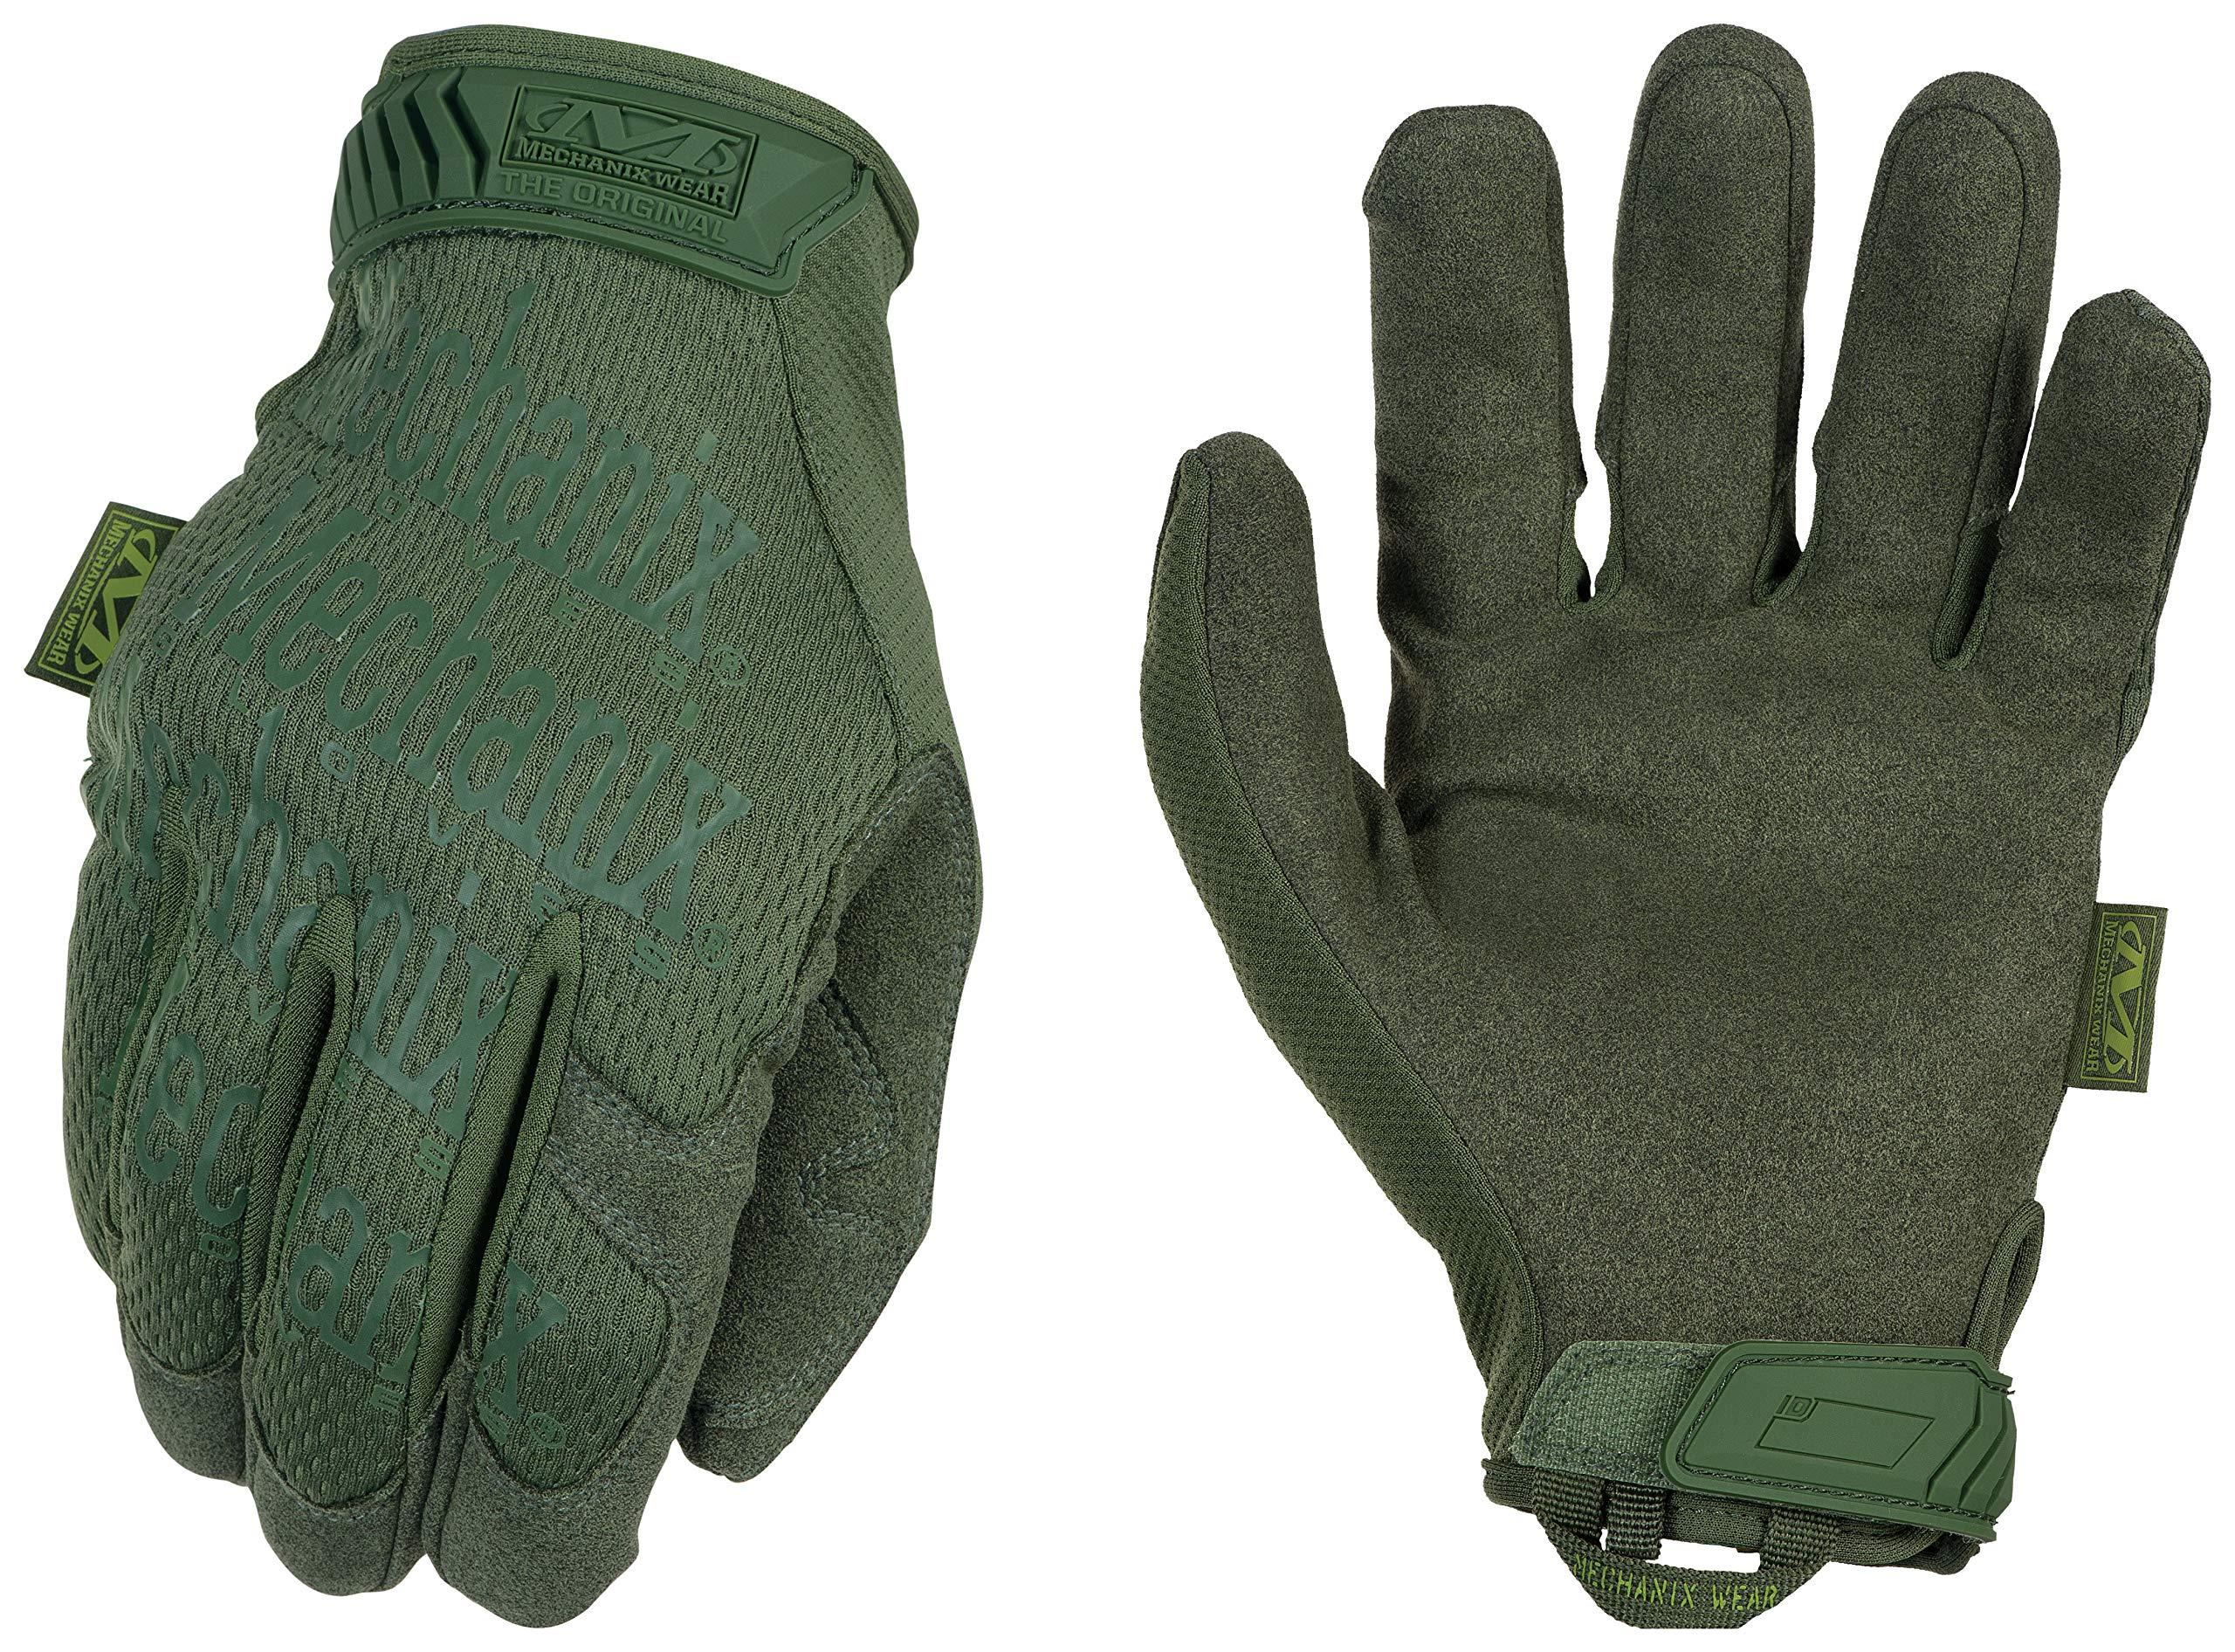 Mechanix The Original Glove, OD Green, X-Large